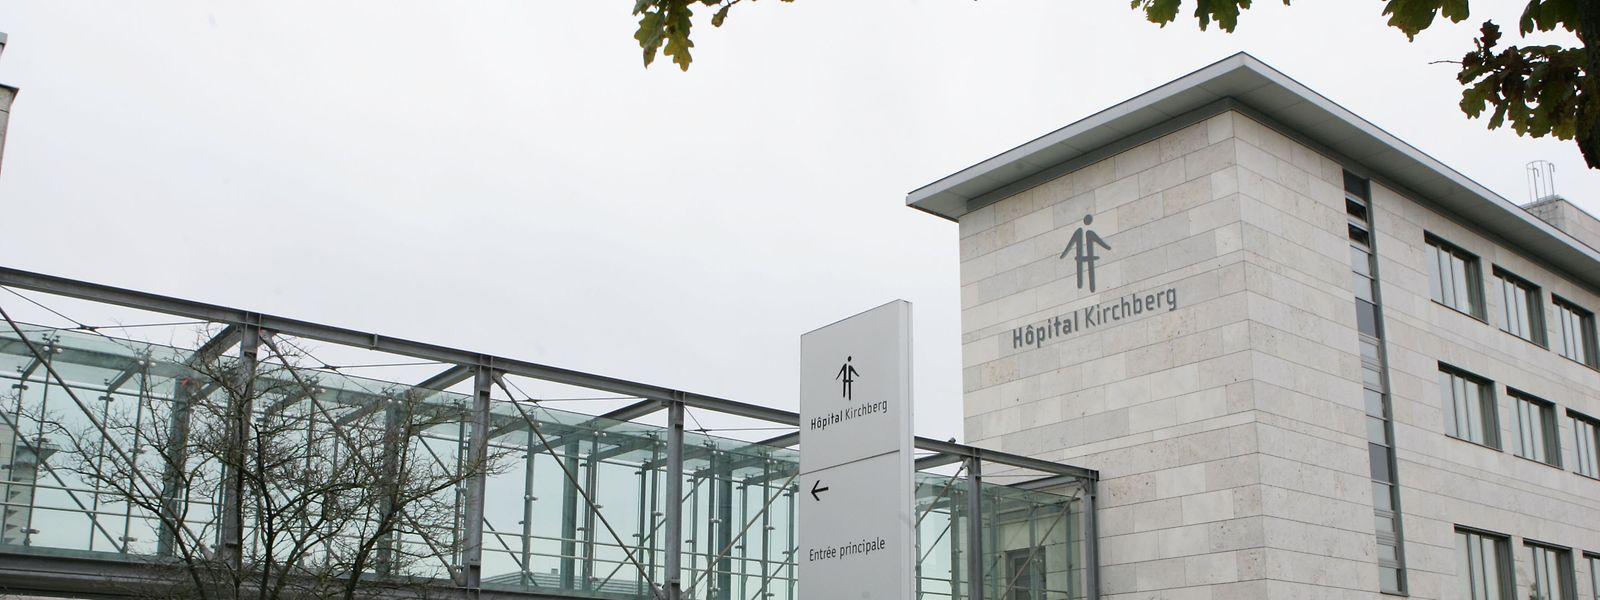 Besonders das Centre Hôpital in Kirchberg steht wegen teurer Parkhauspreise in der Kritik.